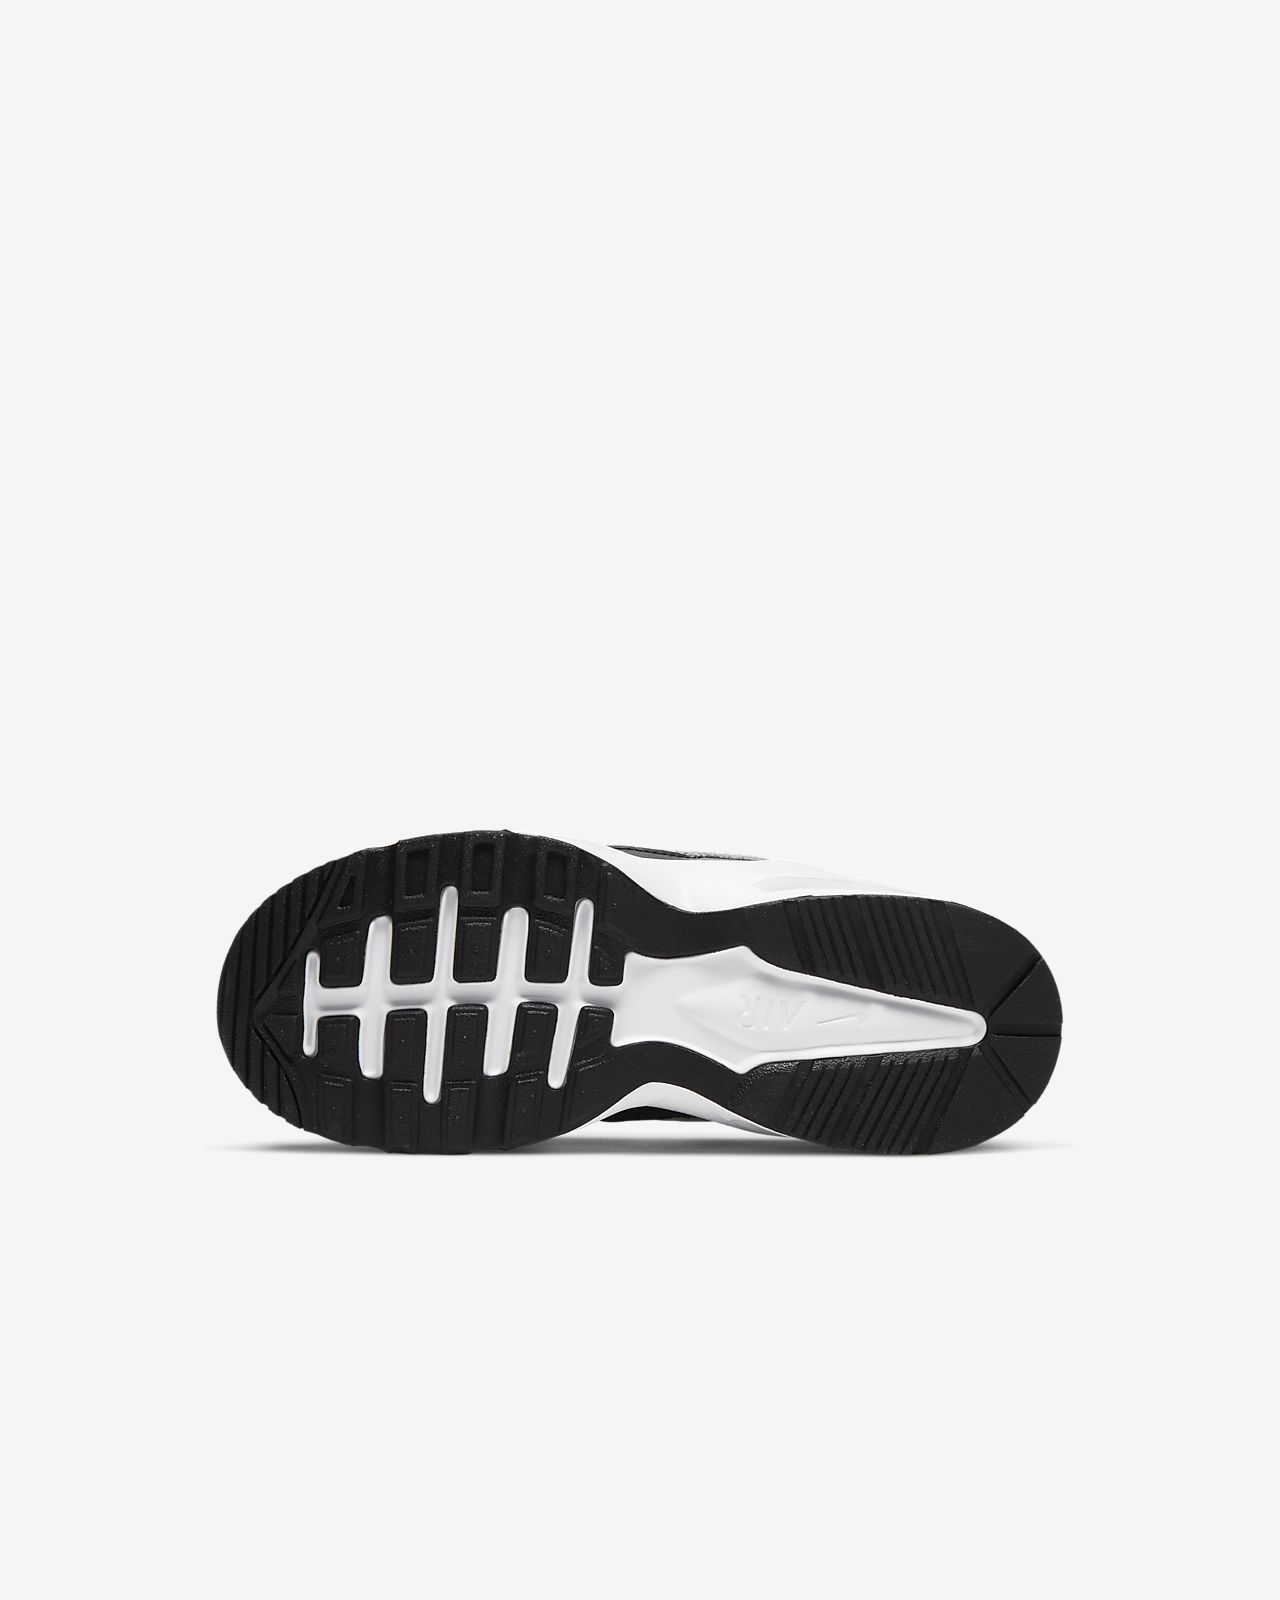 Nike Air Max 90 Leather Kids Trainers Boys Girls Kid Children Sports School Shoe